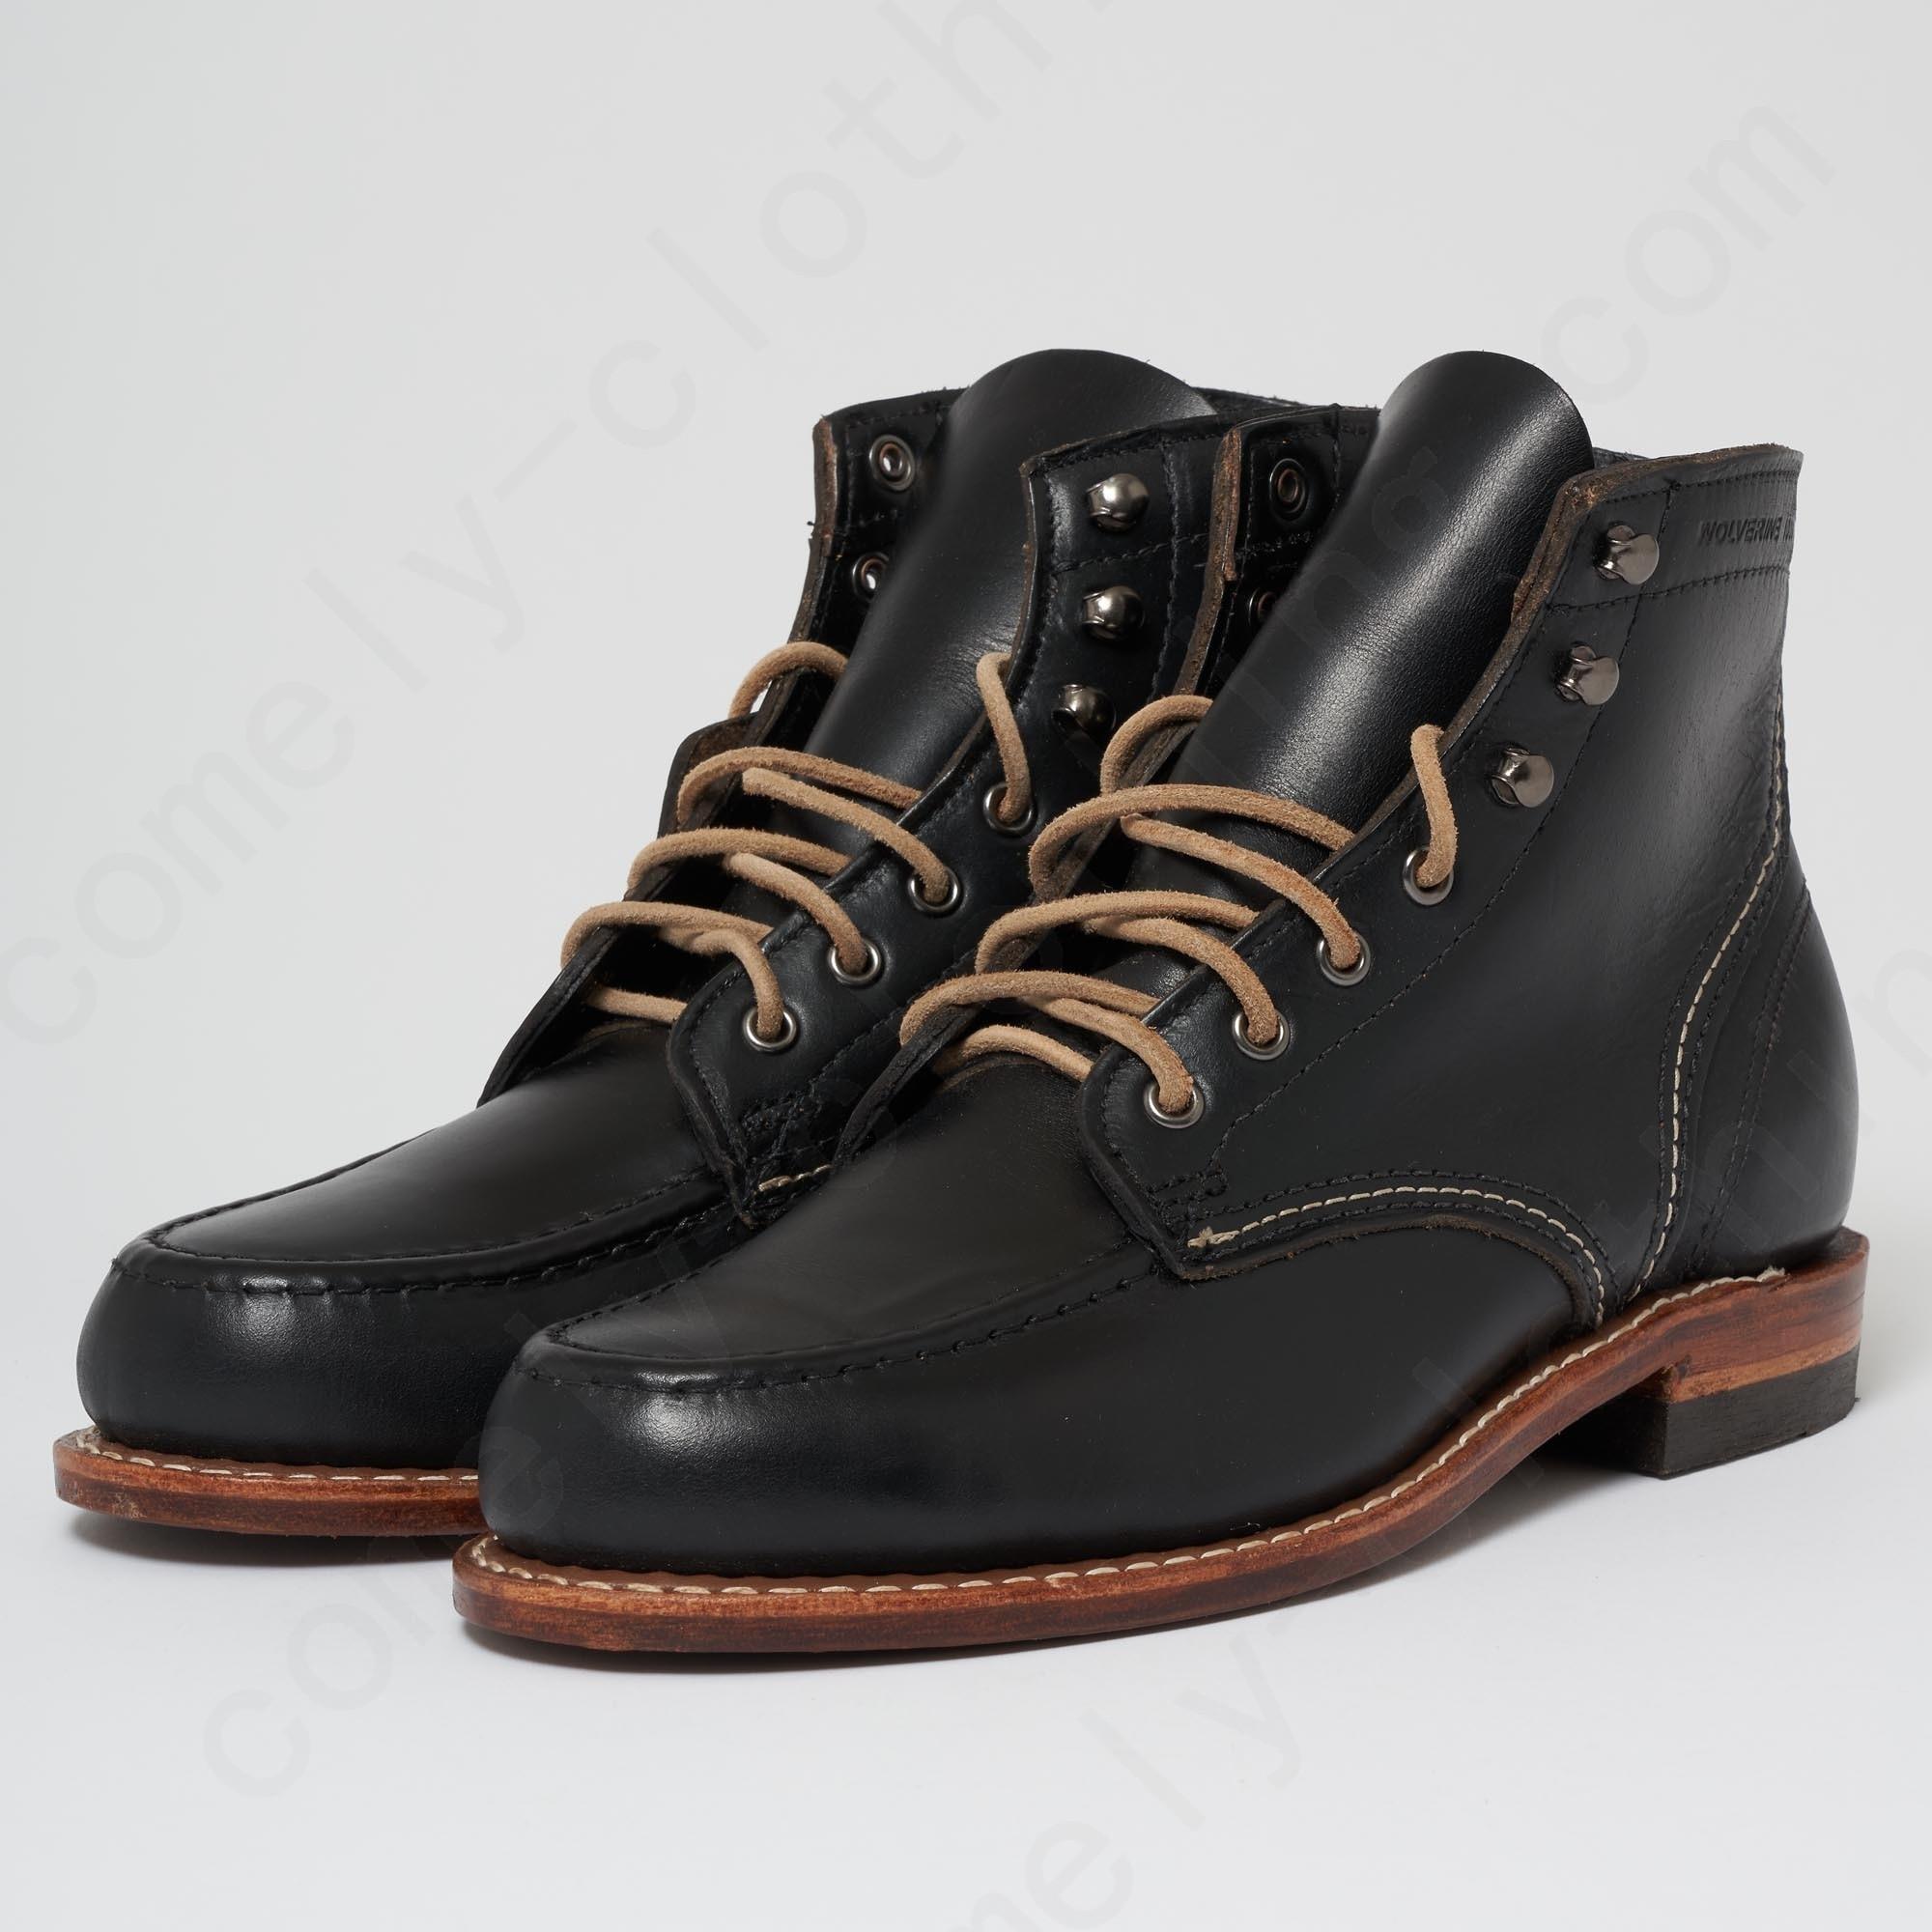 Wolverine 1000 Mile Black Mile Boot Men - Wolverine 1000 Mile Black Mile Boot Men